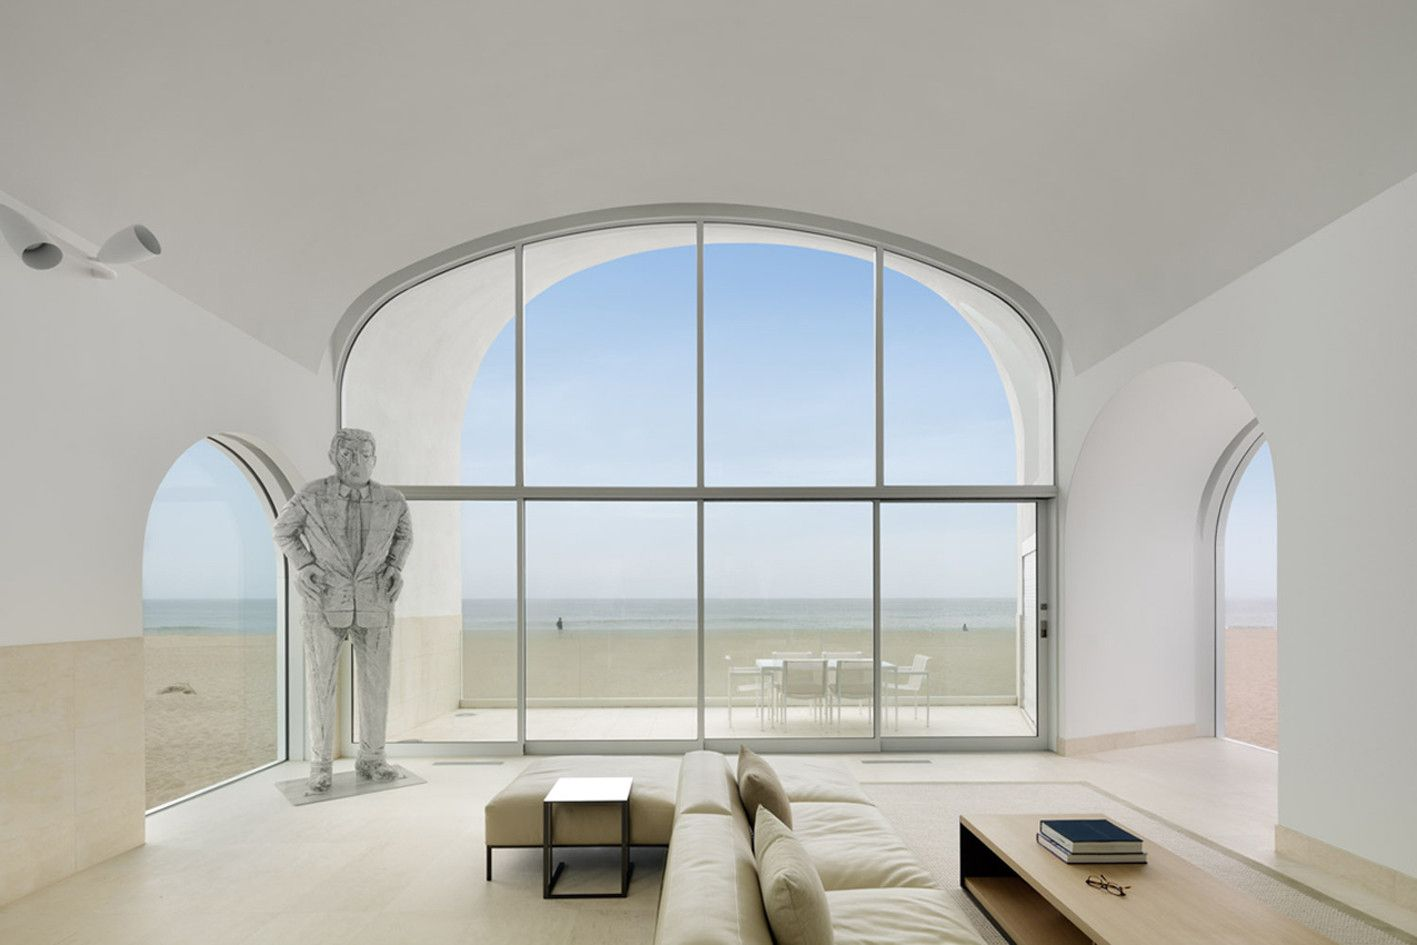 Matteoli Mobili ~ Storiesondesignbyyellowtrace: modern arches in architecture